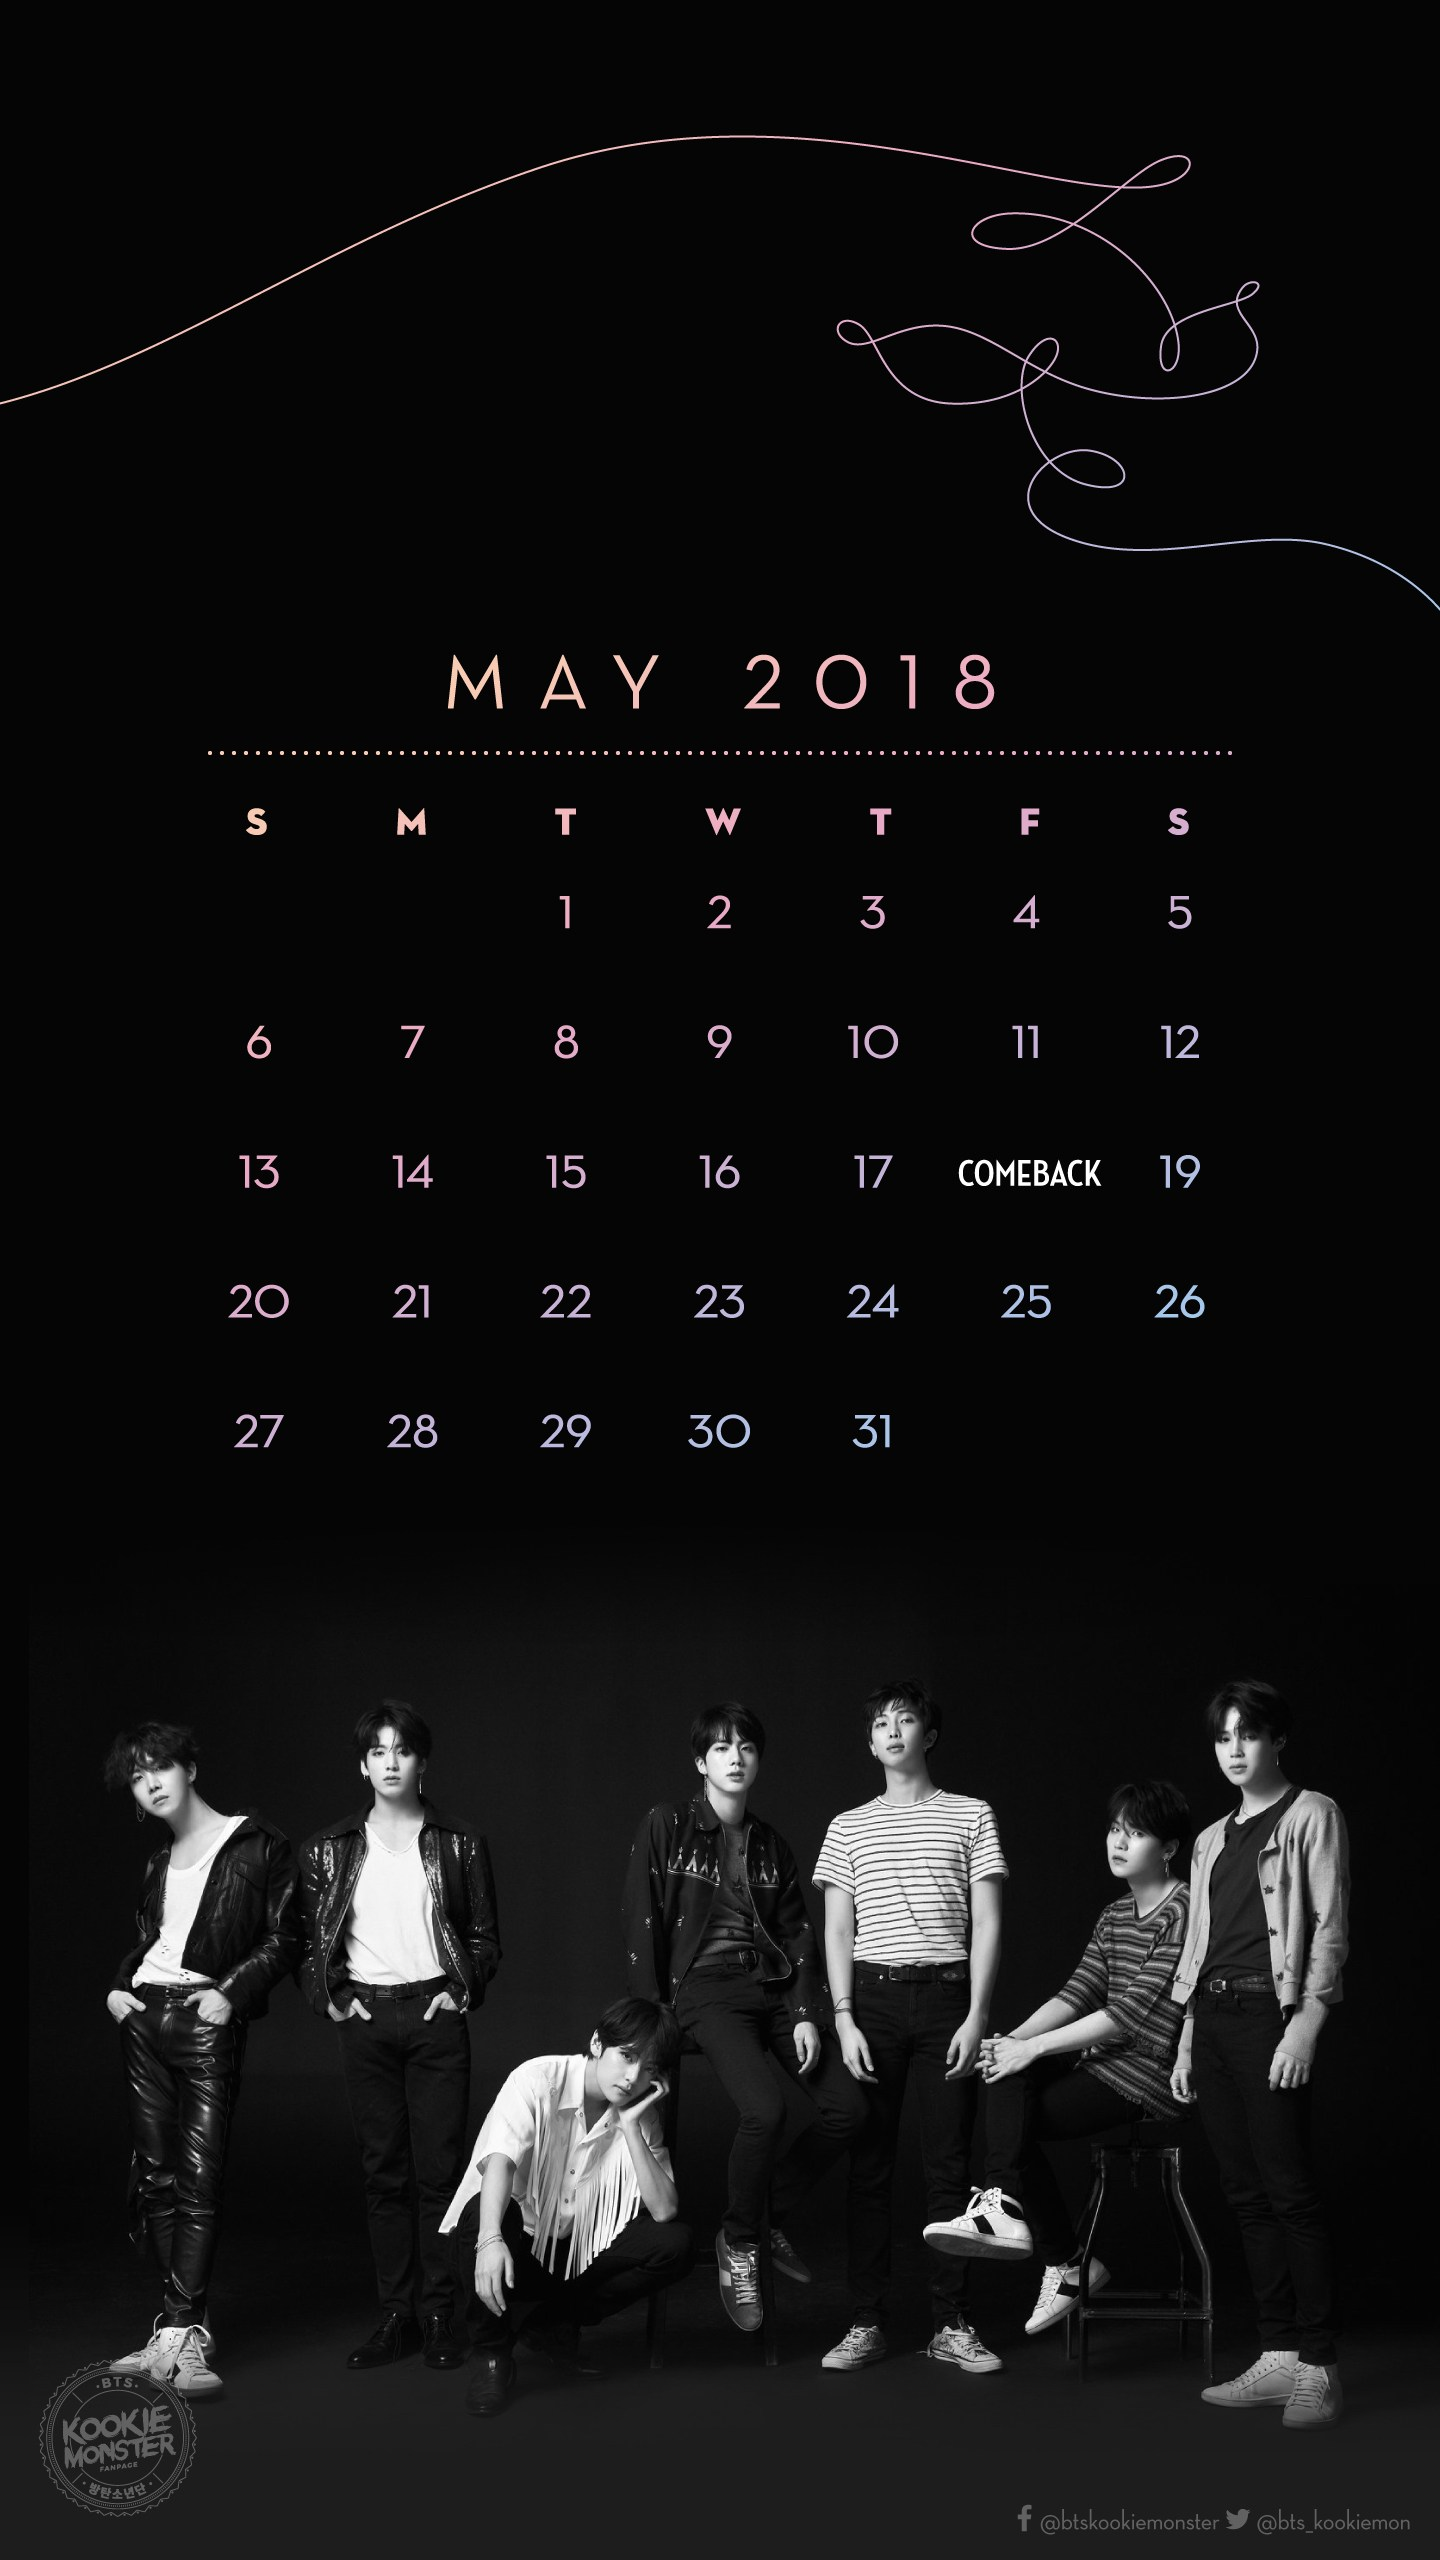 2018 Monthly Calendars Bts The Truth Untold Lyrics 23543 Hd